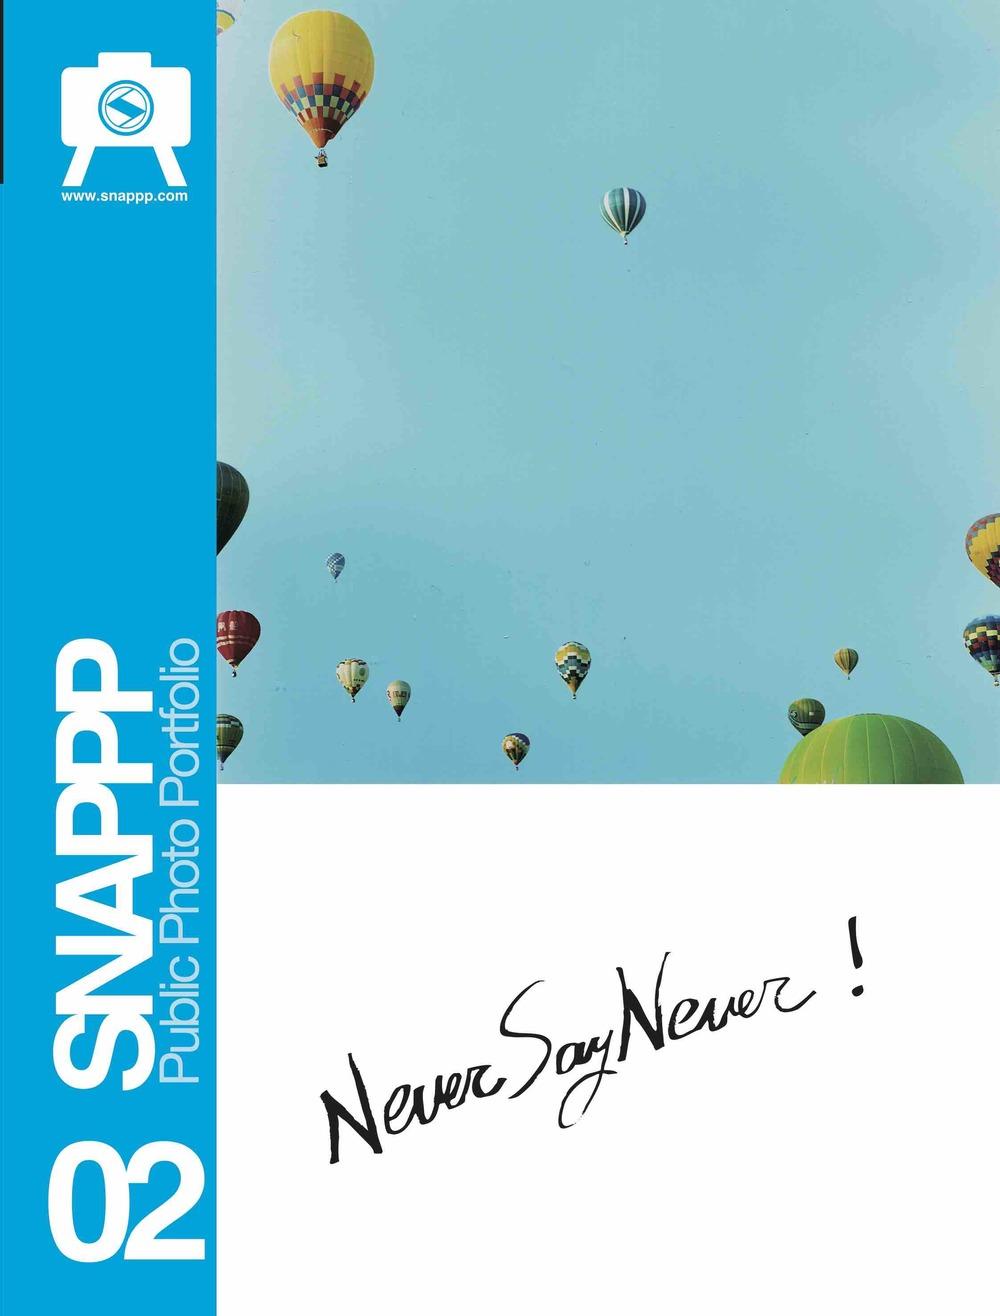 SNAPPP-NO02.jpg